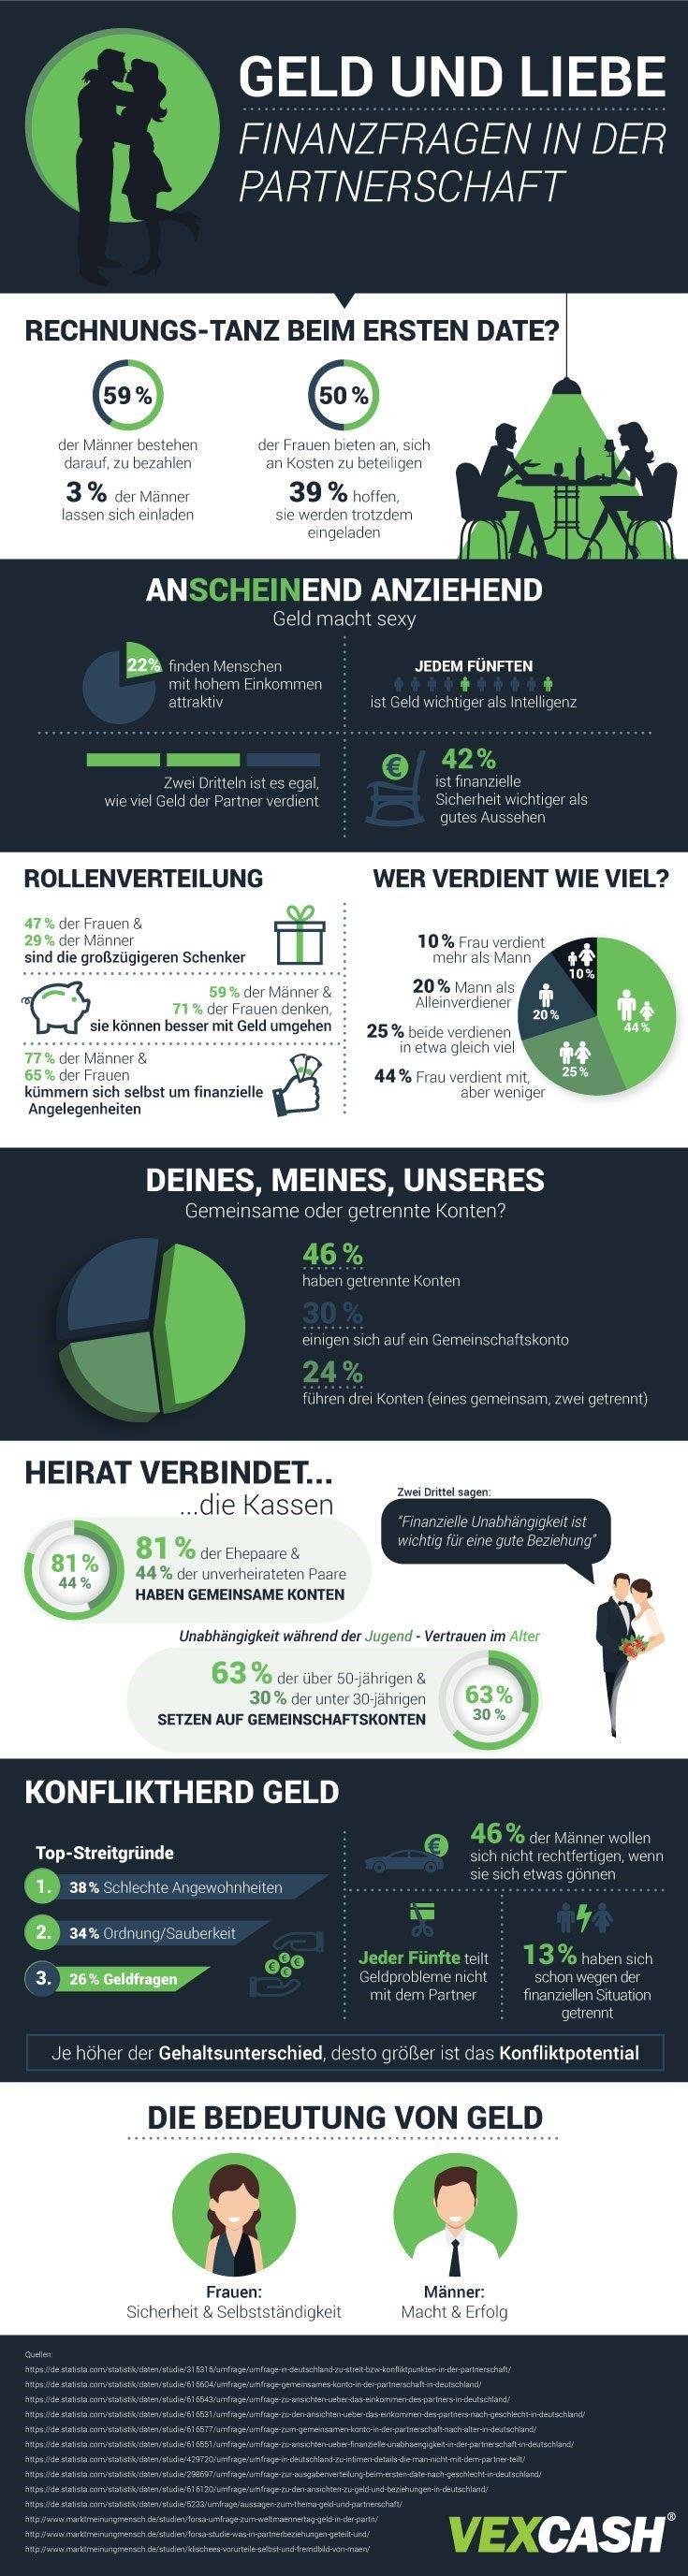 infografik-geld-liebe.jpg